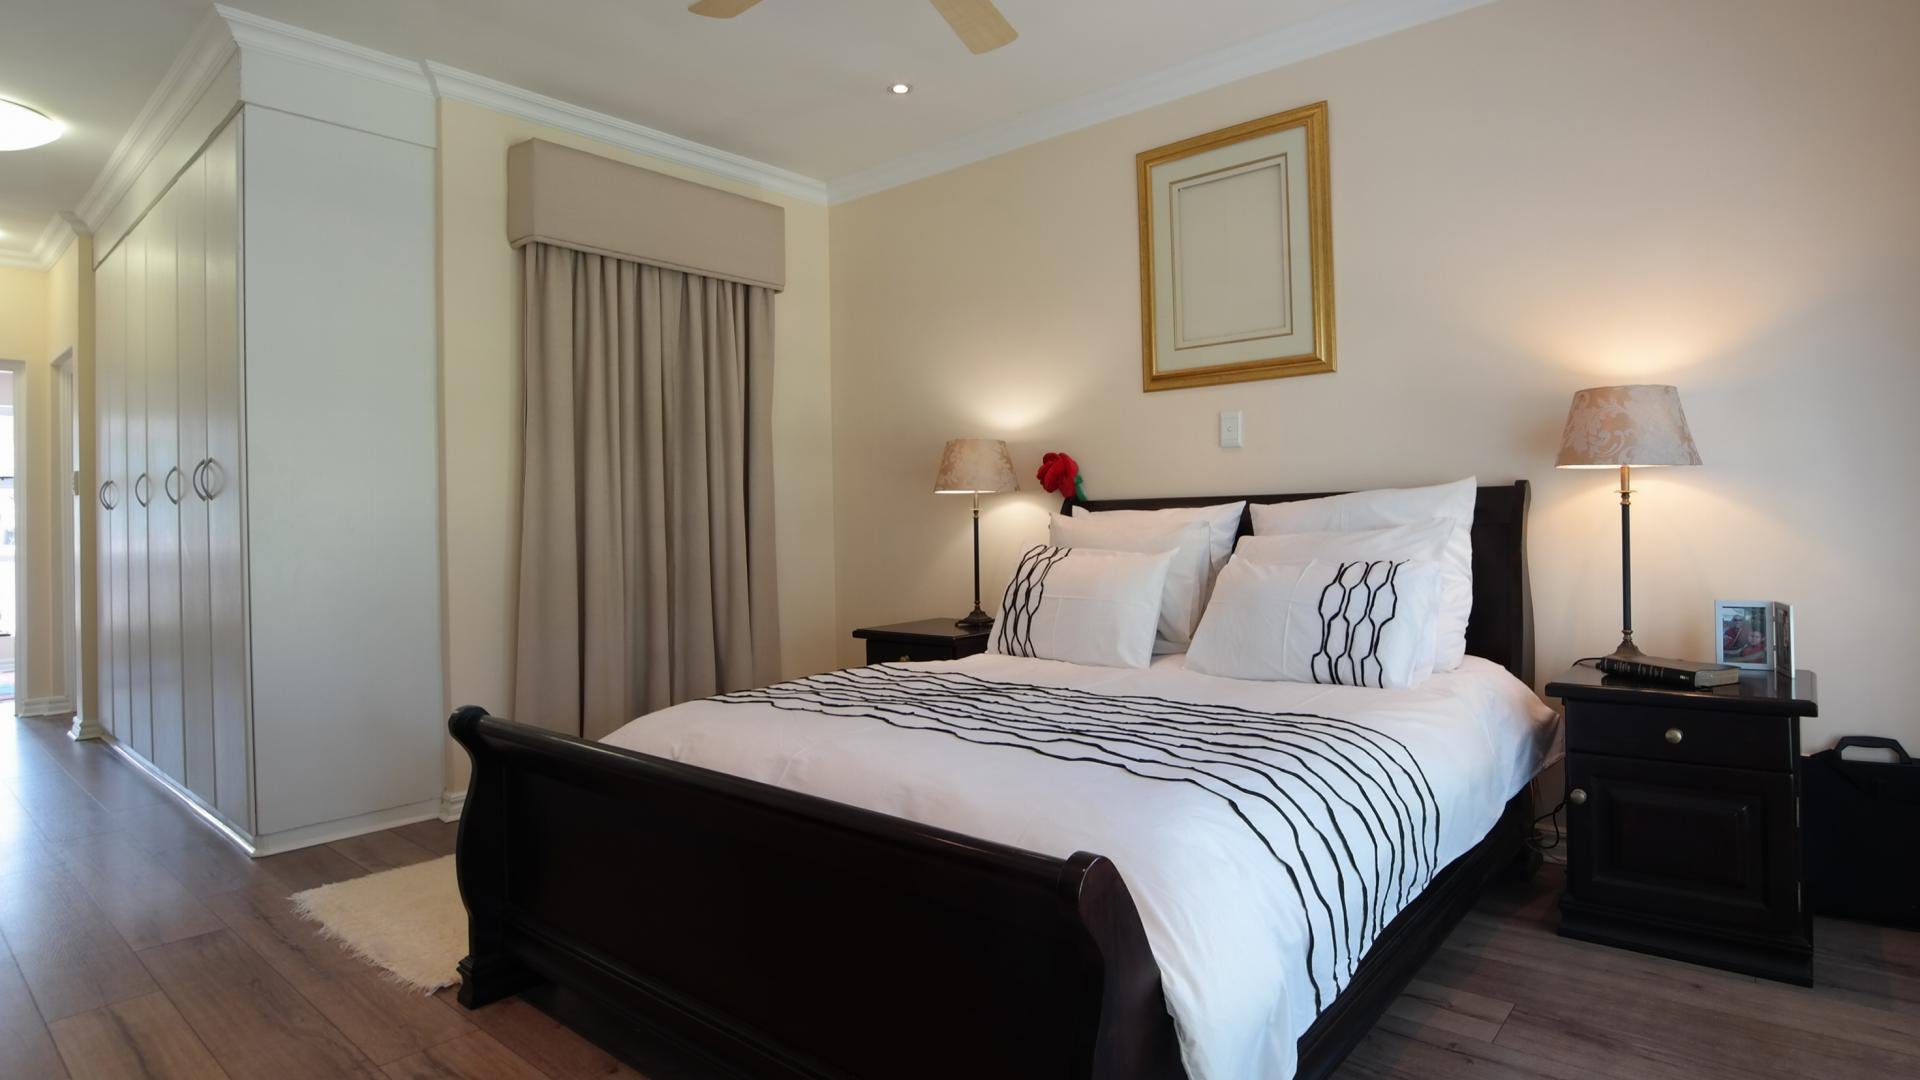 Lifestyle Bedroom Furniture Myroof 5 Bedroom House For Sale In Woodlands Lifestyle Estate